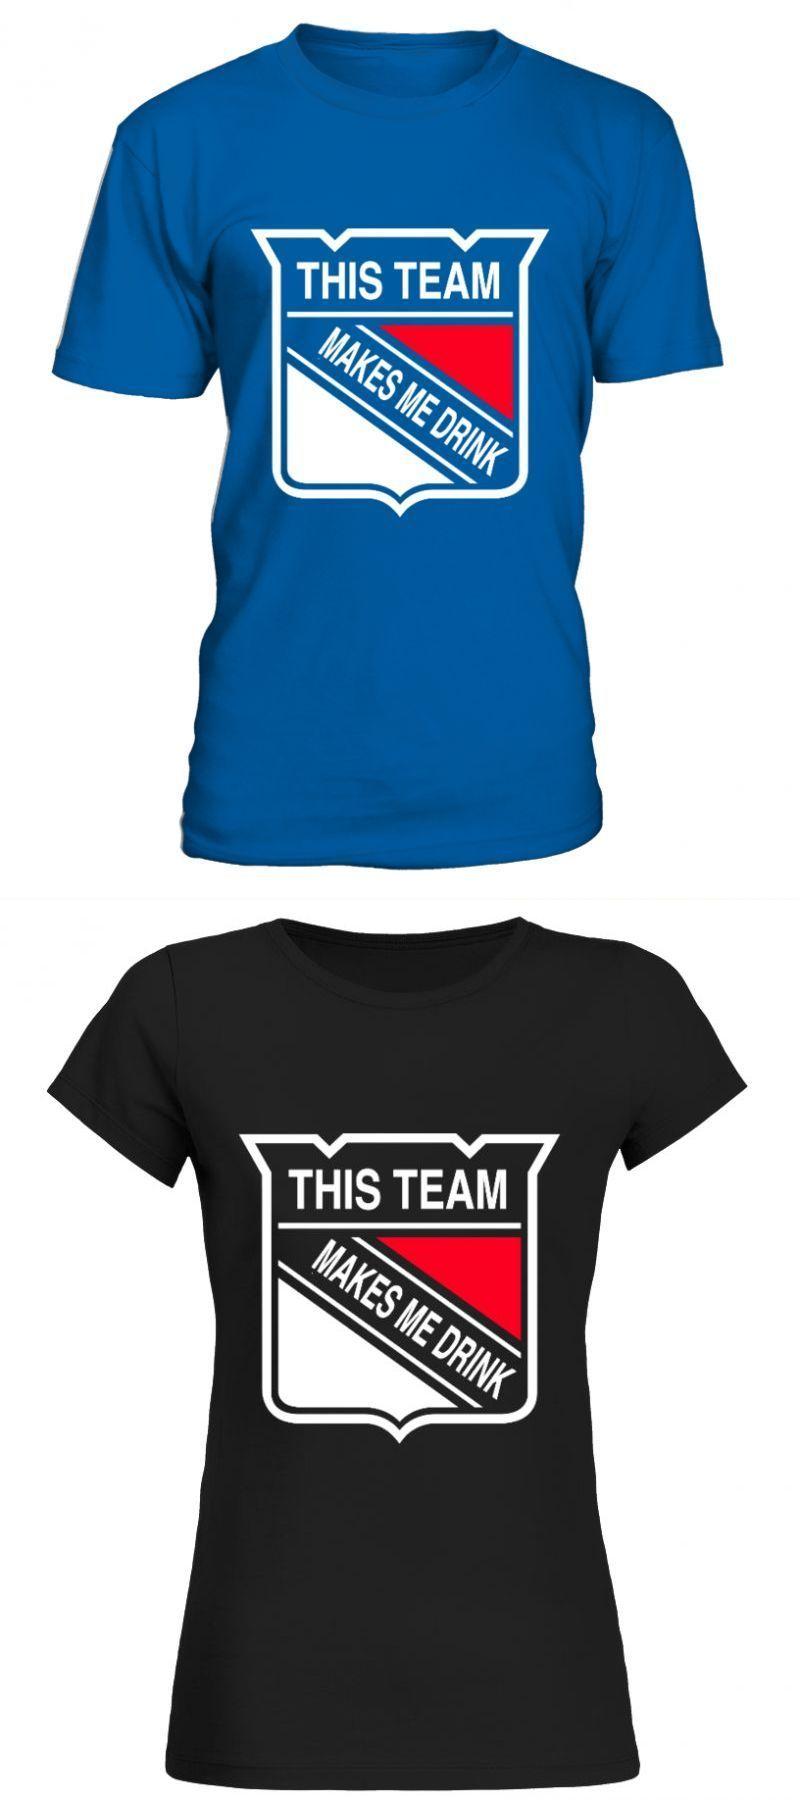 sale retailer 5e12a a38e3 Russia hockey t-shirt nyr drink (new york rangers) hockey ...